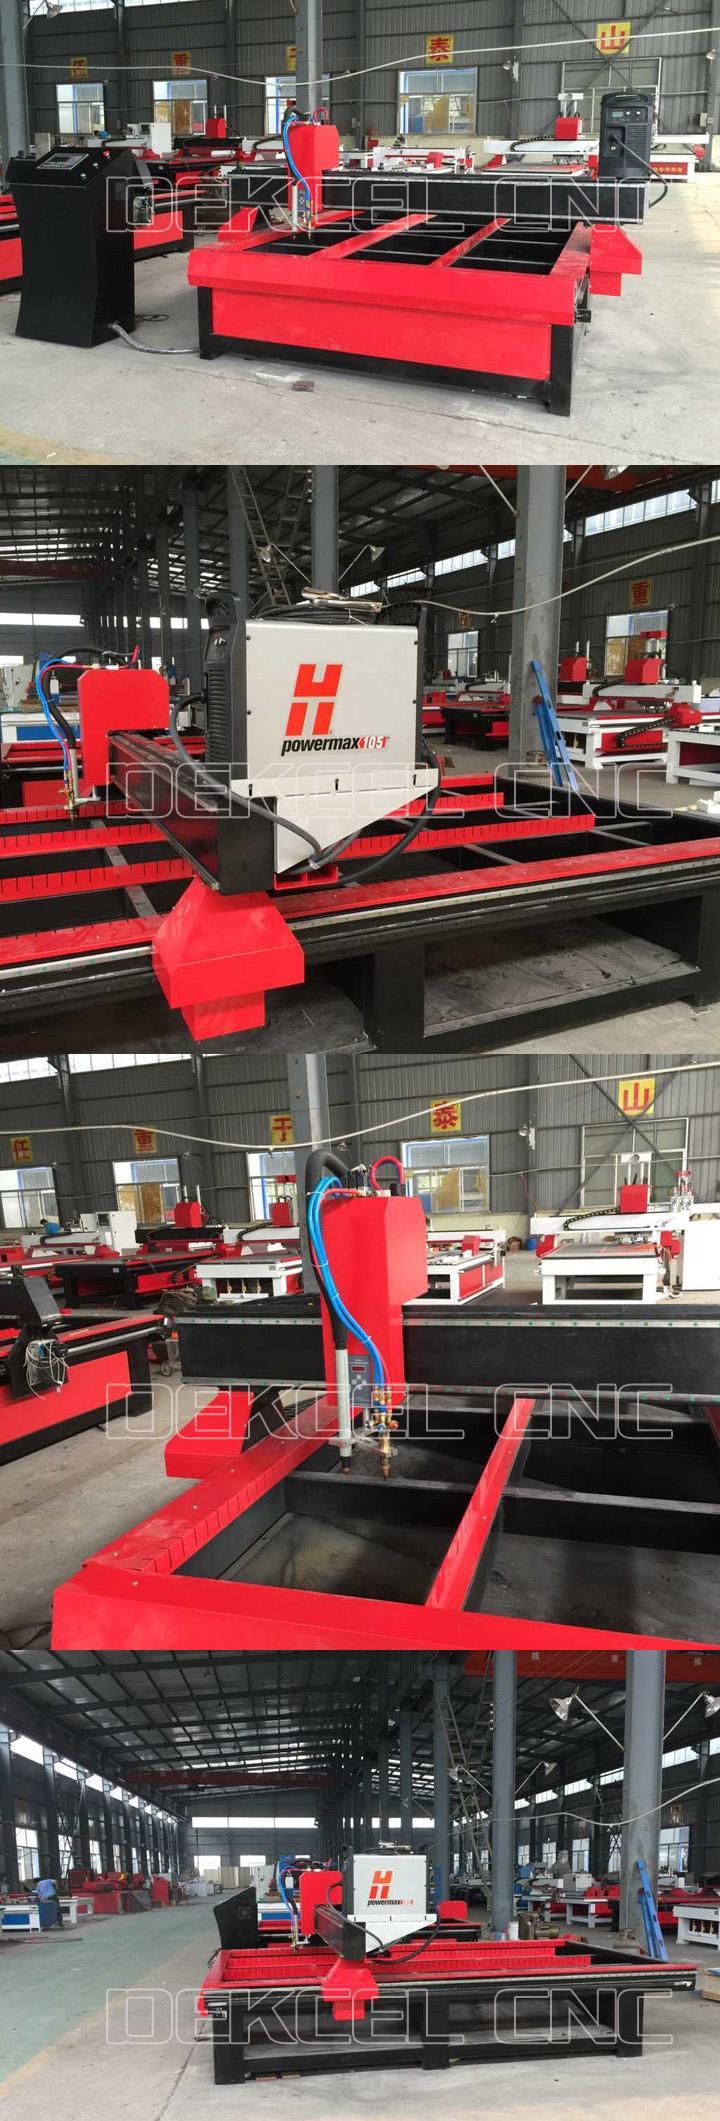 dekcel cnc plasma metal cutters machine for sale